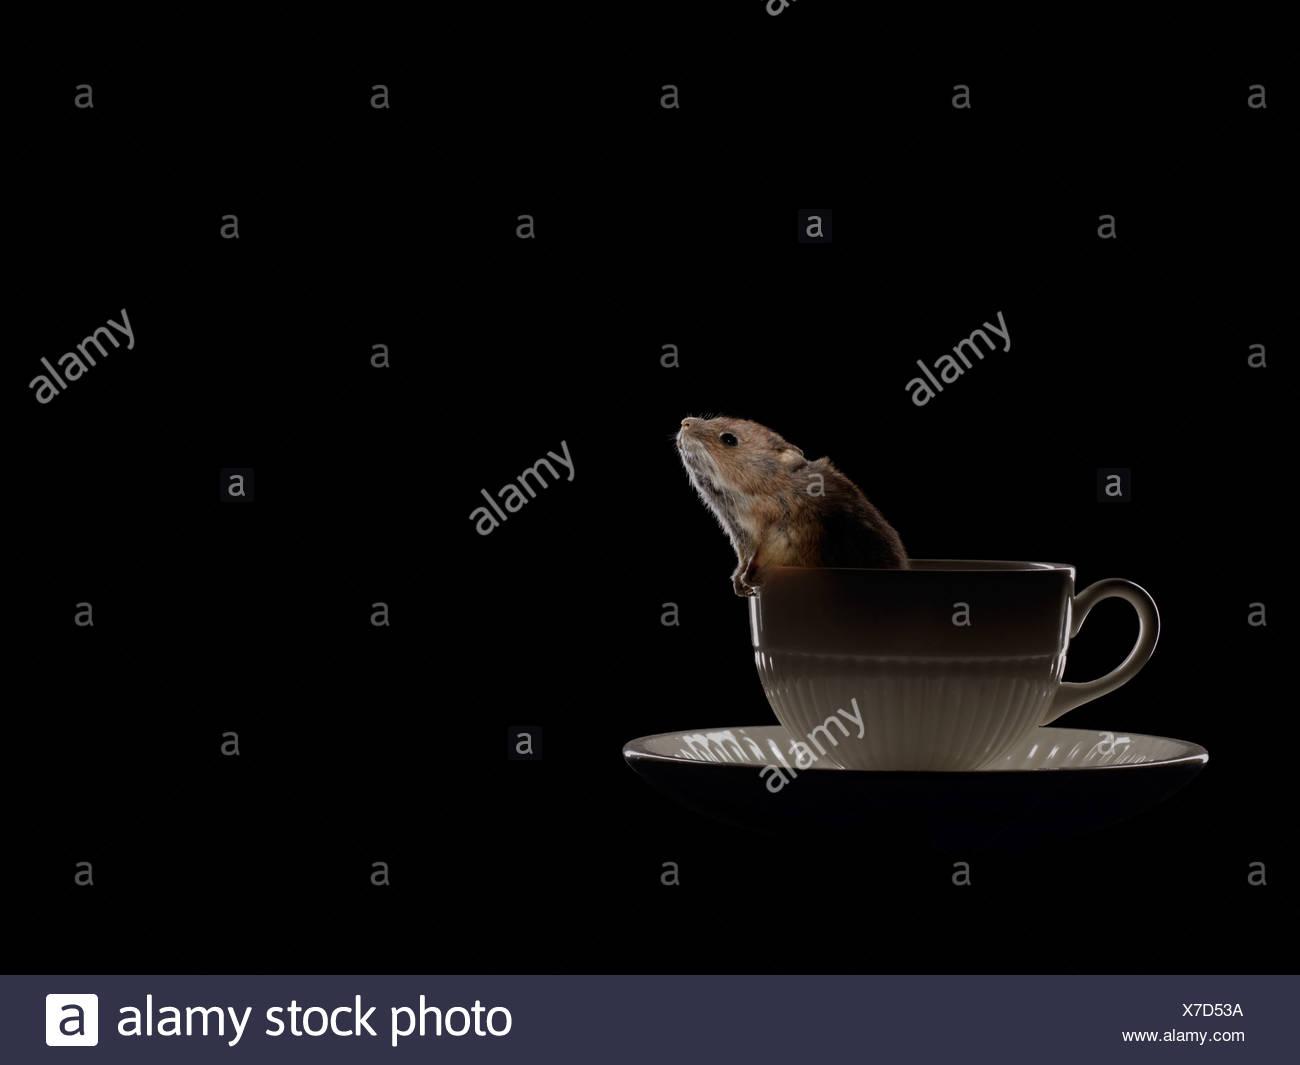 Maus im Wasserglas Stockbild